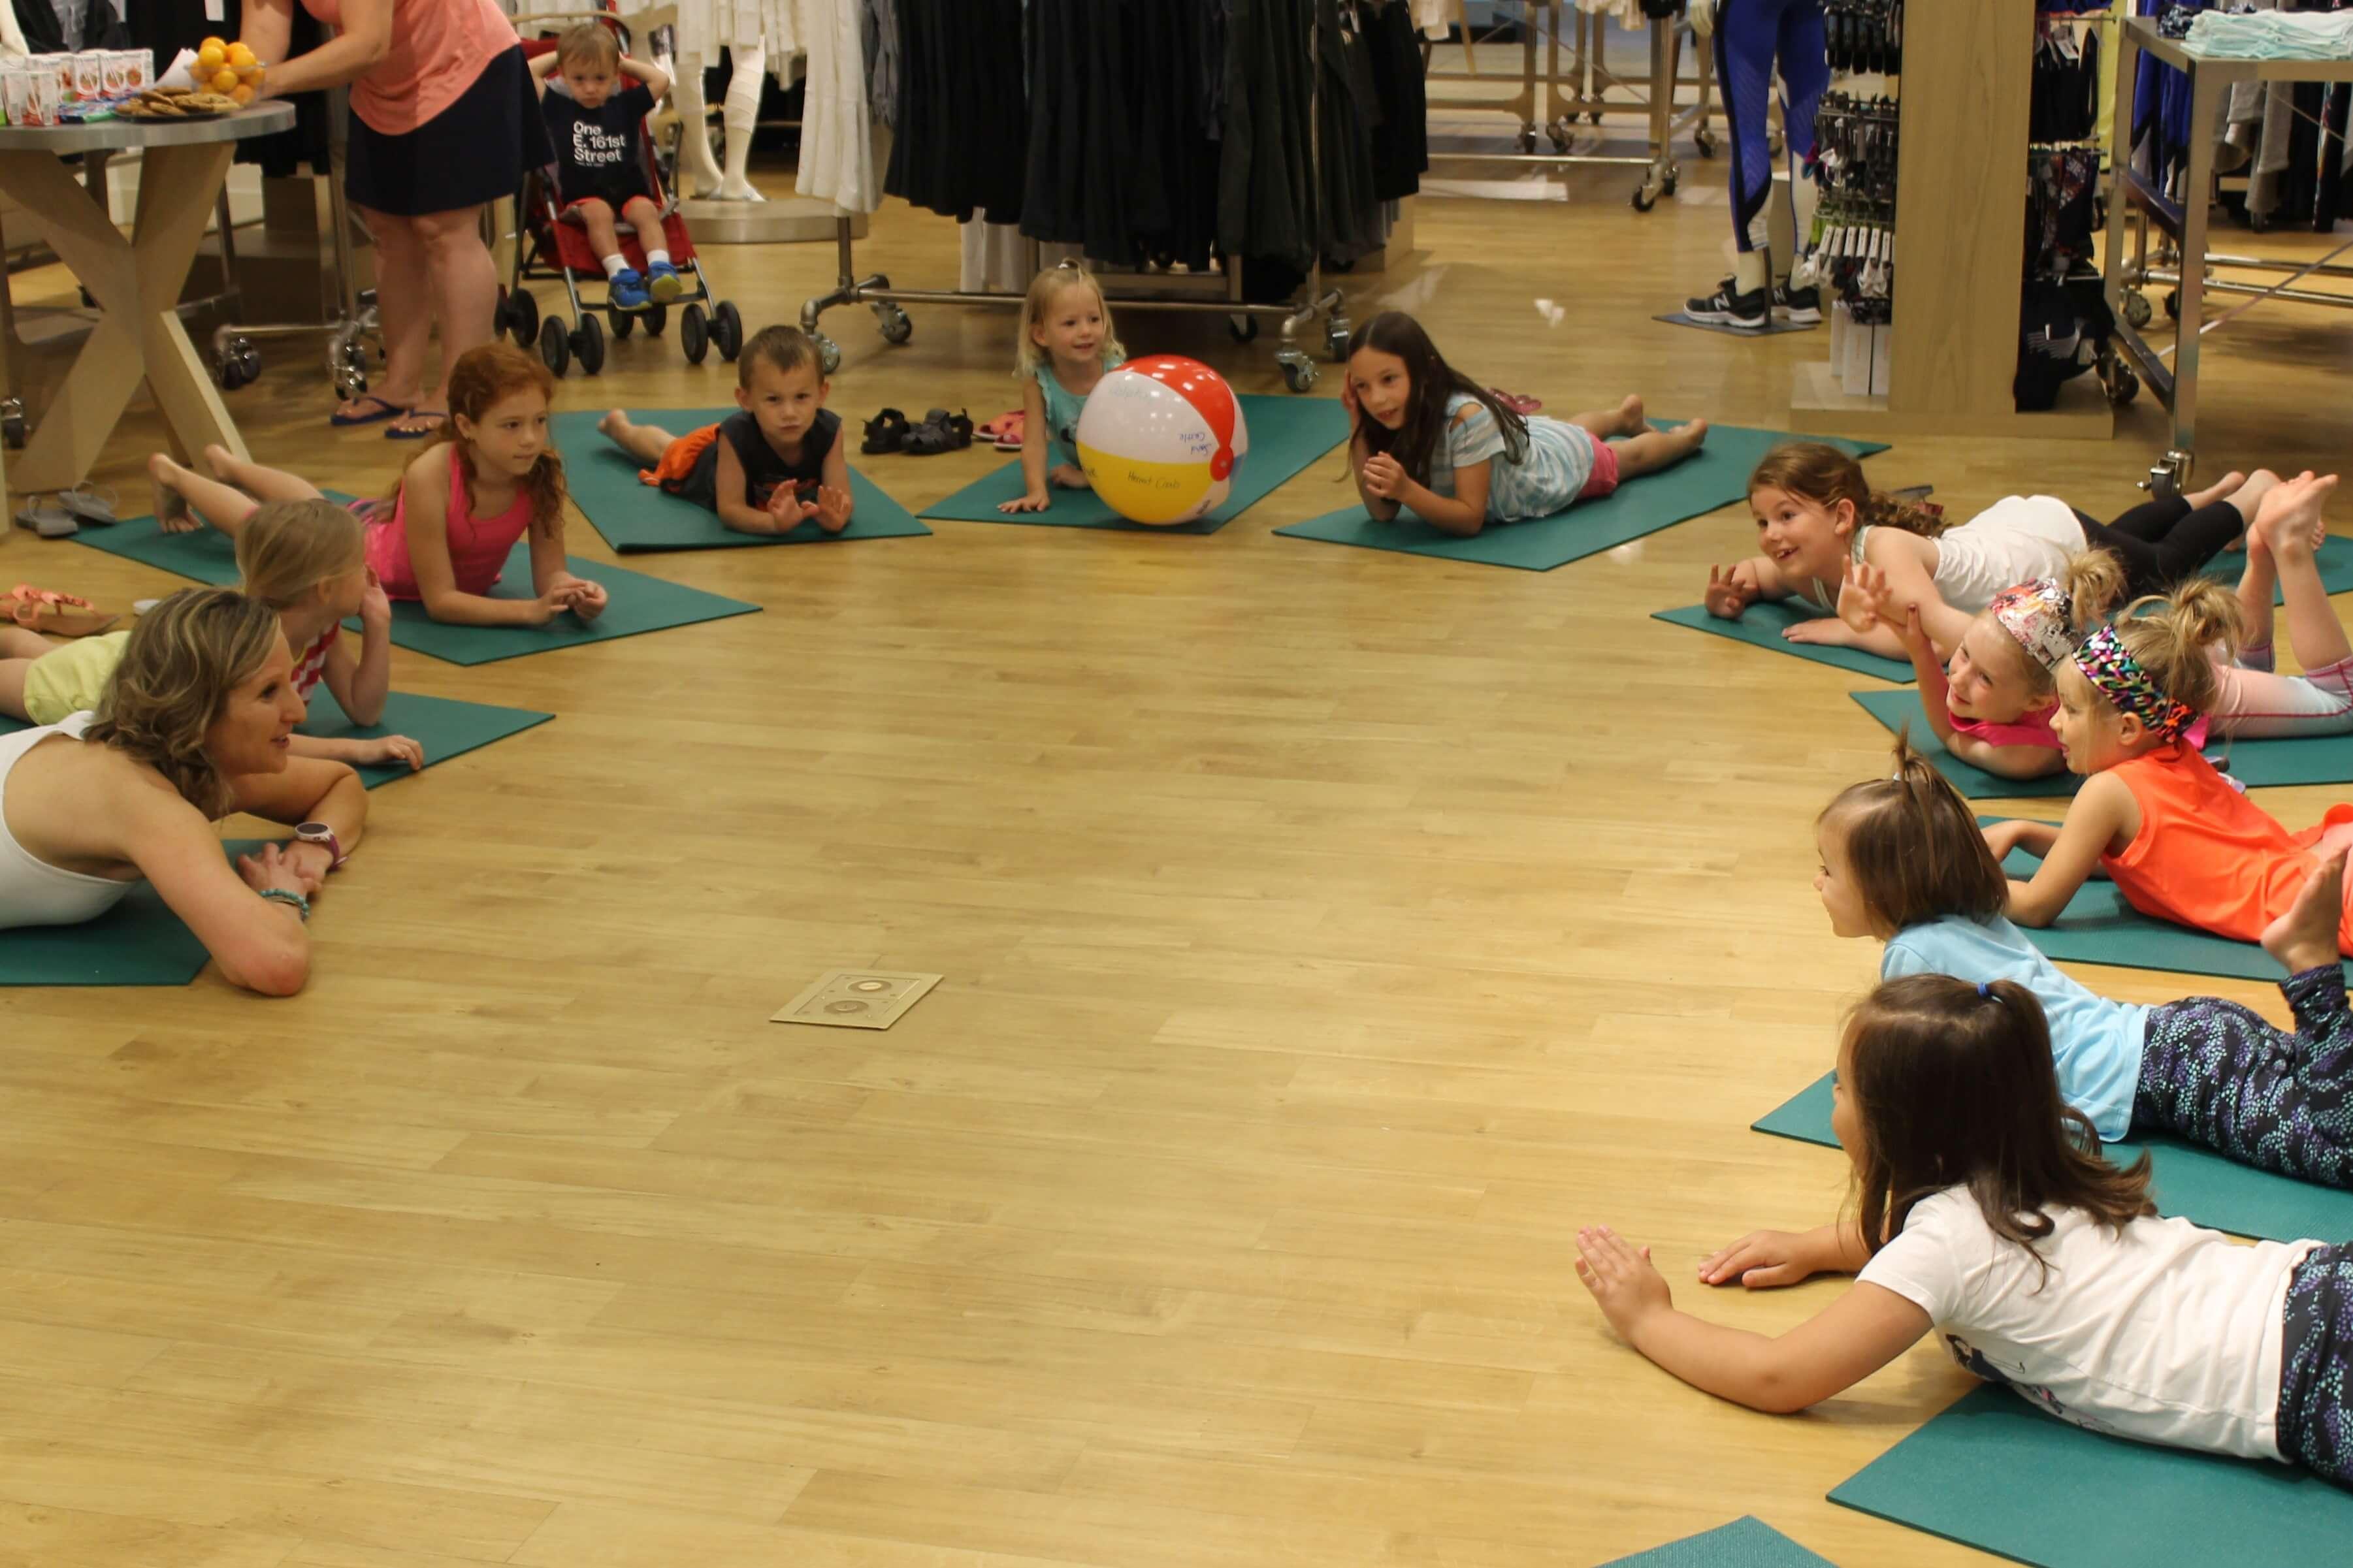 Fun in the Sun Kids Yoga Class at Athleta - Go Go Yoga For ...